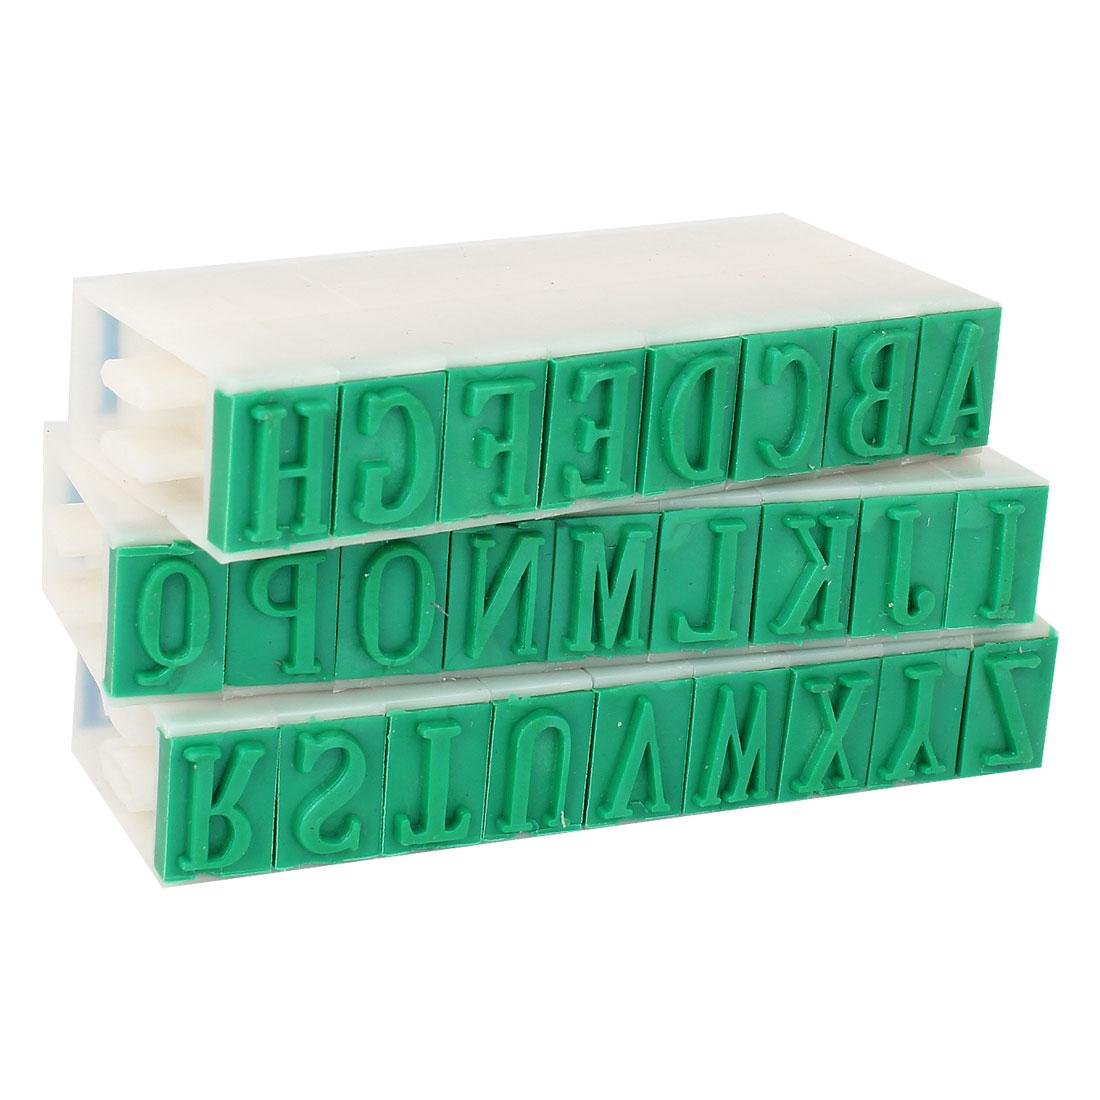 Unique Bargains 26 Letters Plastic Rubber Detachable Alphabet Stamp Educational Students Stationery White Green